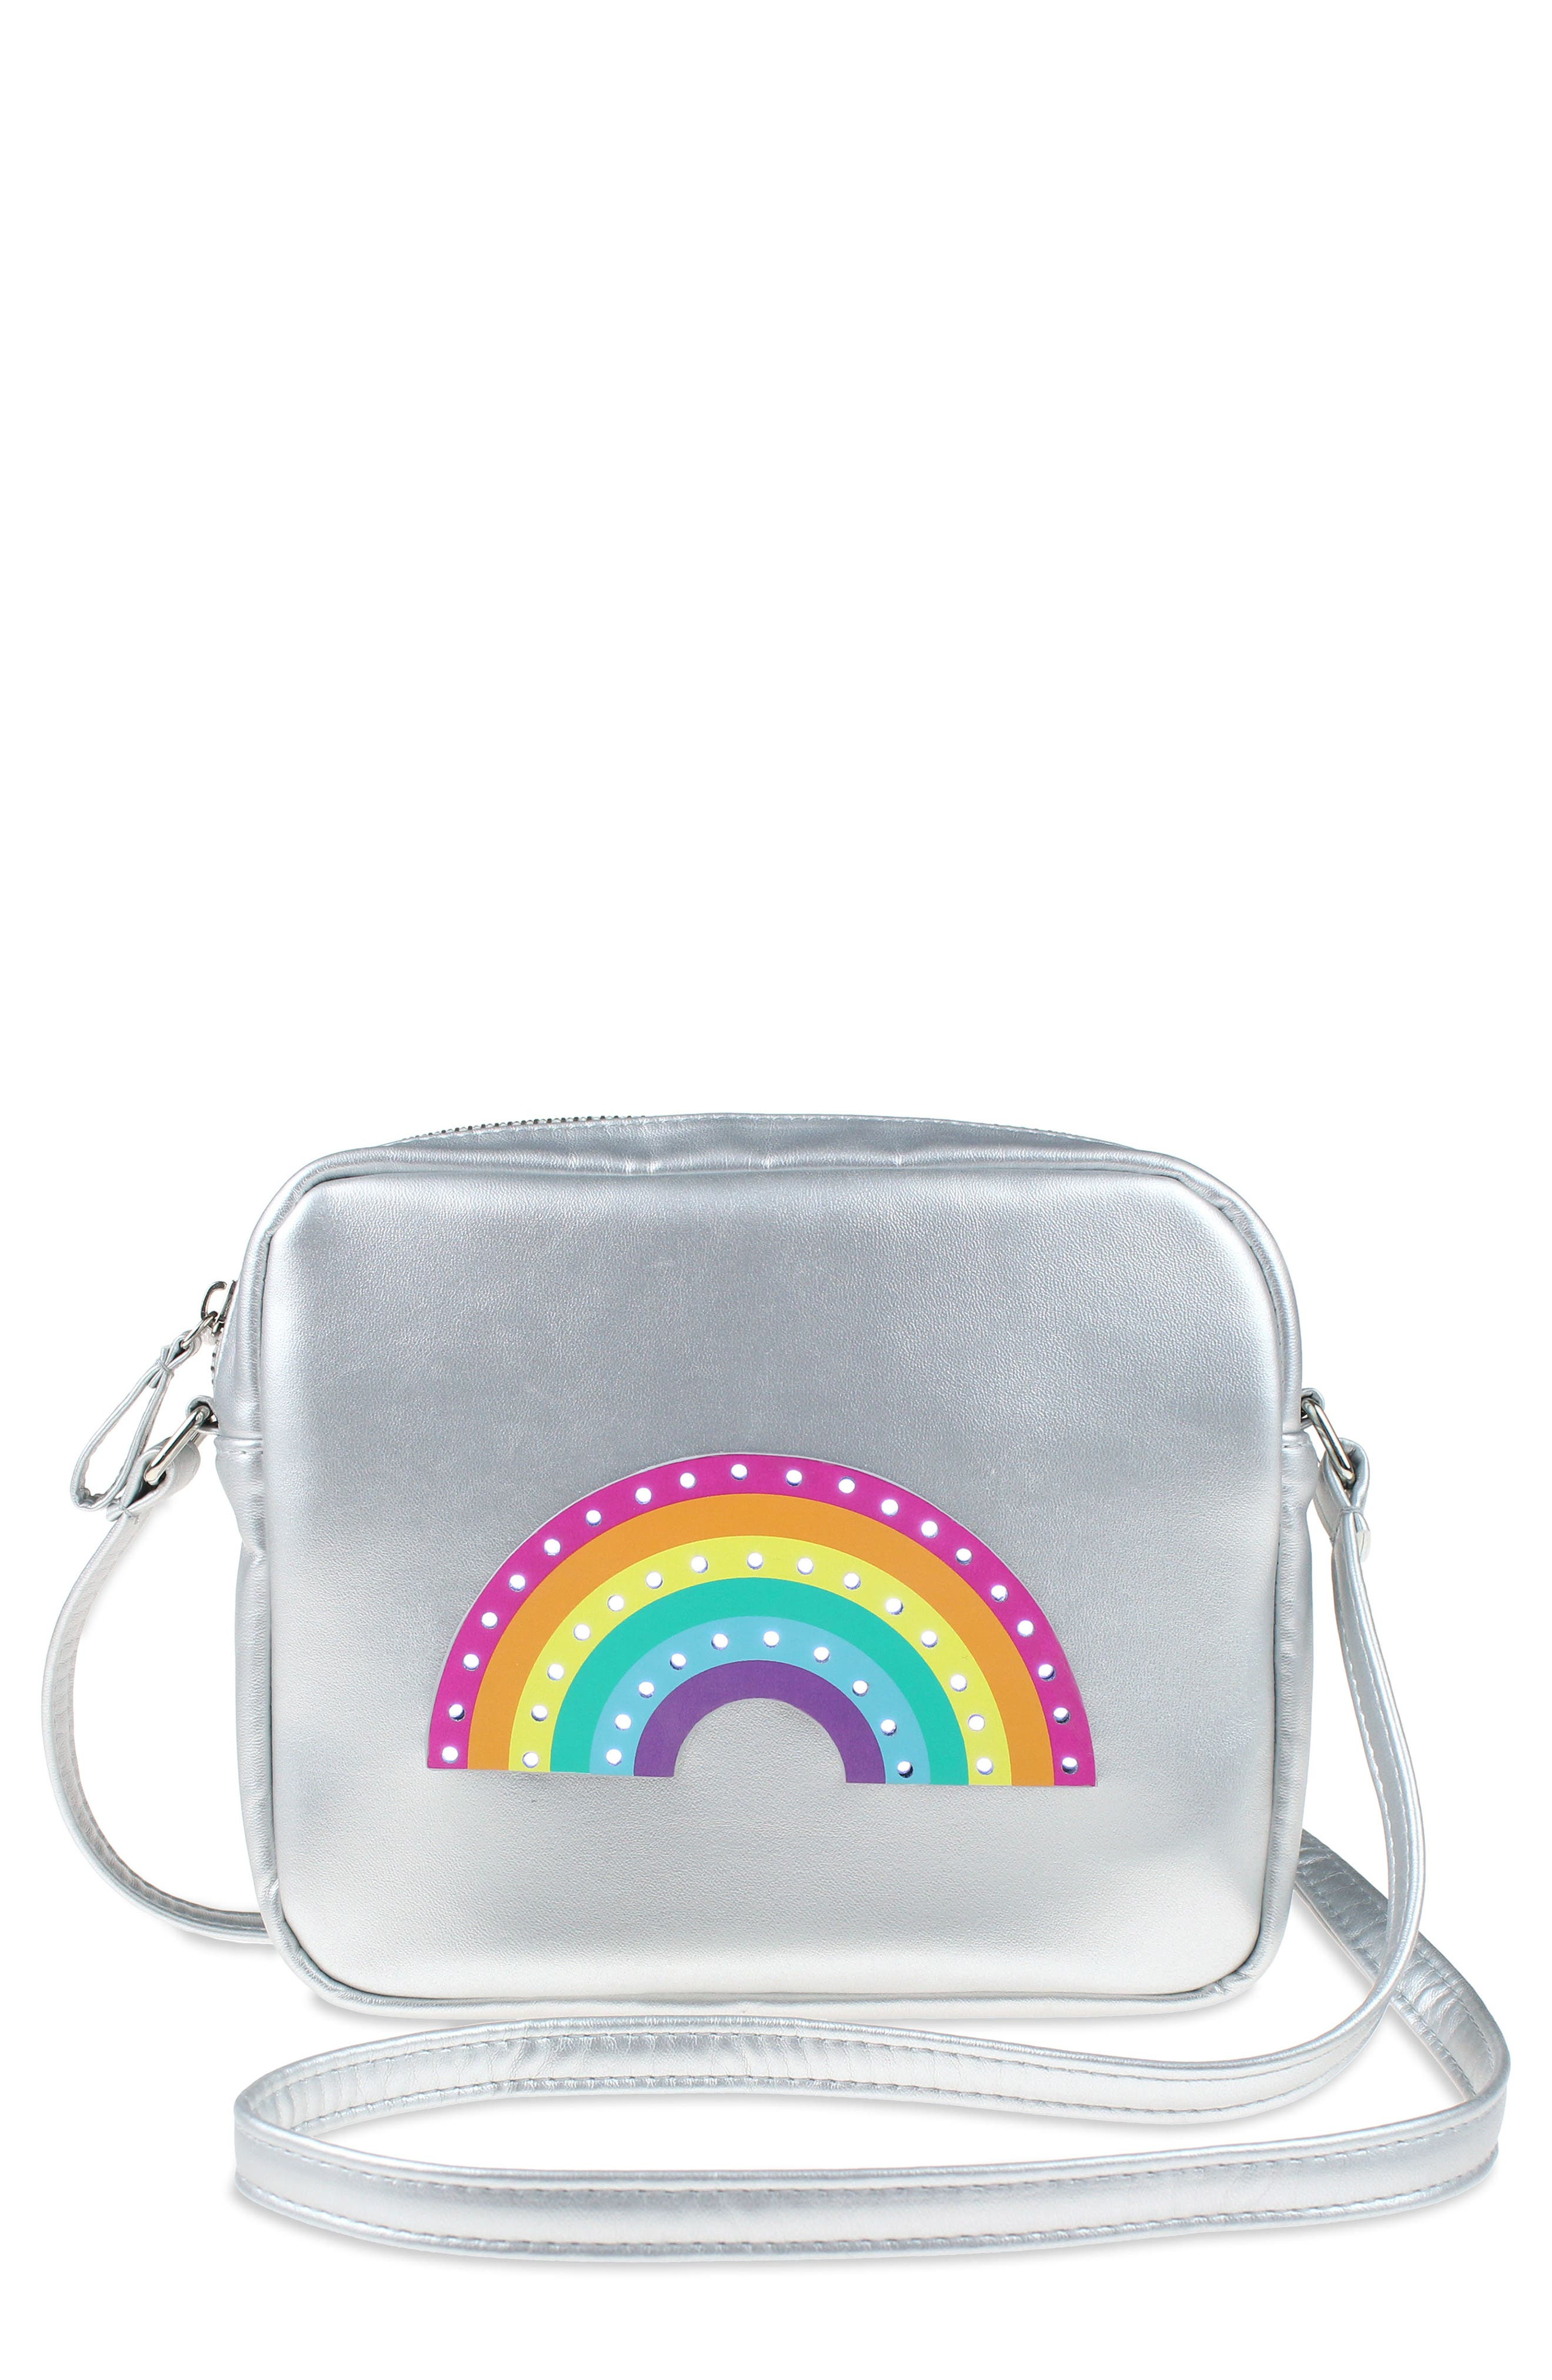 Capelli LED Light-Up Rainbow Faux Leather Crossbody Bag,                             Main thumbnail 1, color,